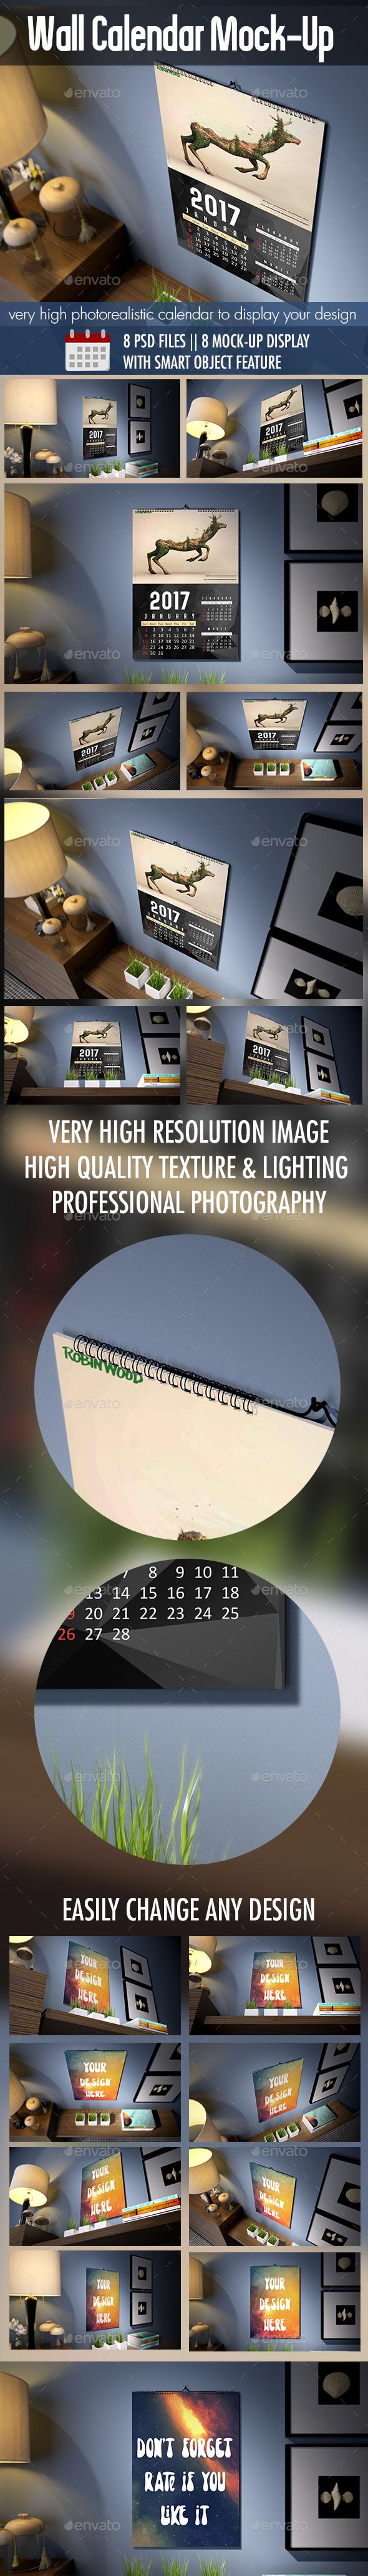 Photorealistic Wall Calendar MockUp - Print Product Mock-Ups